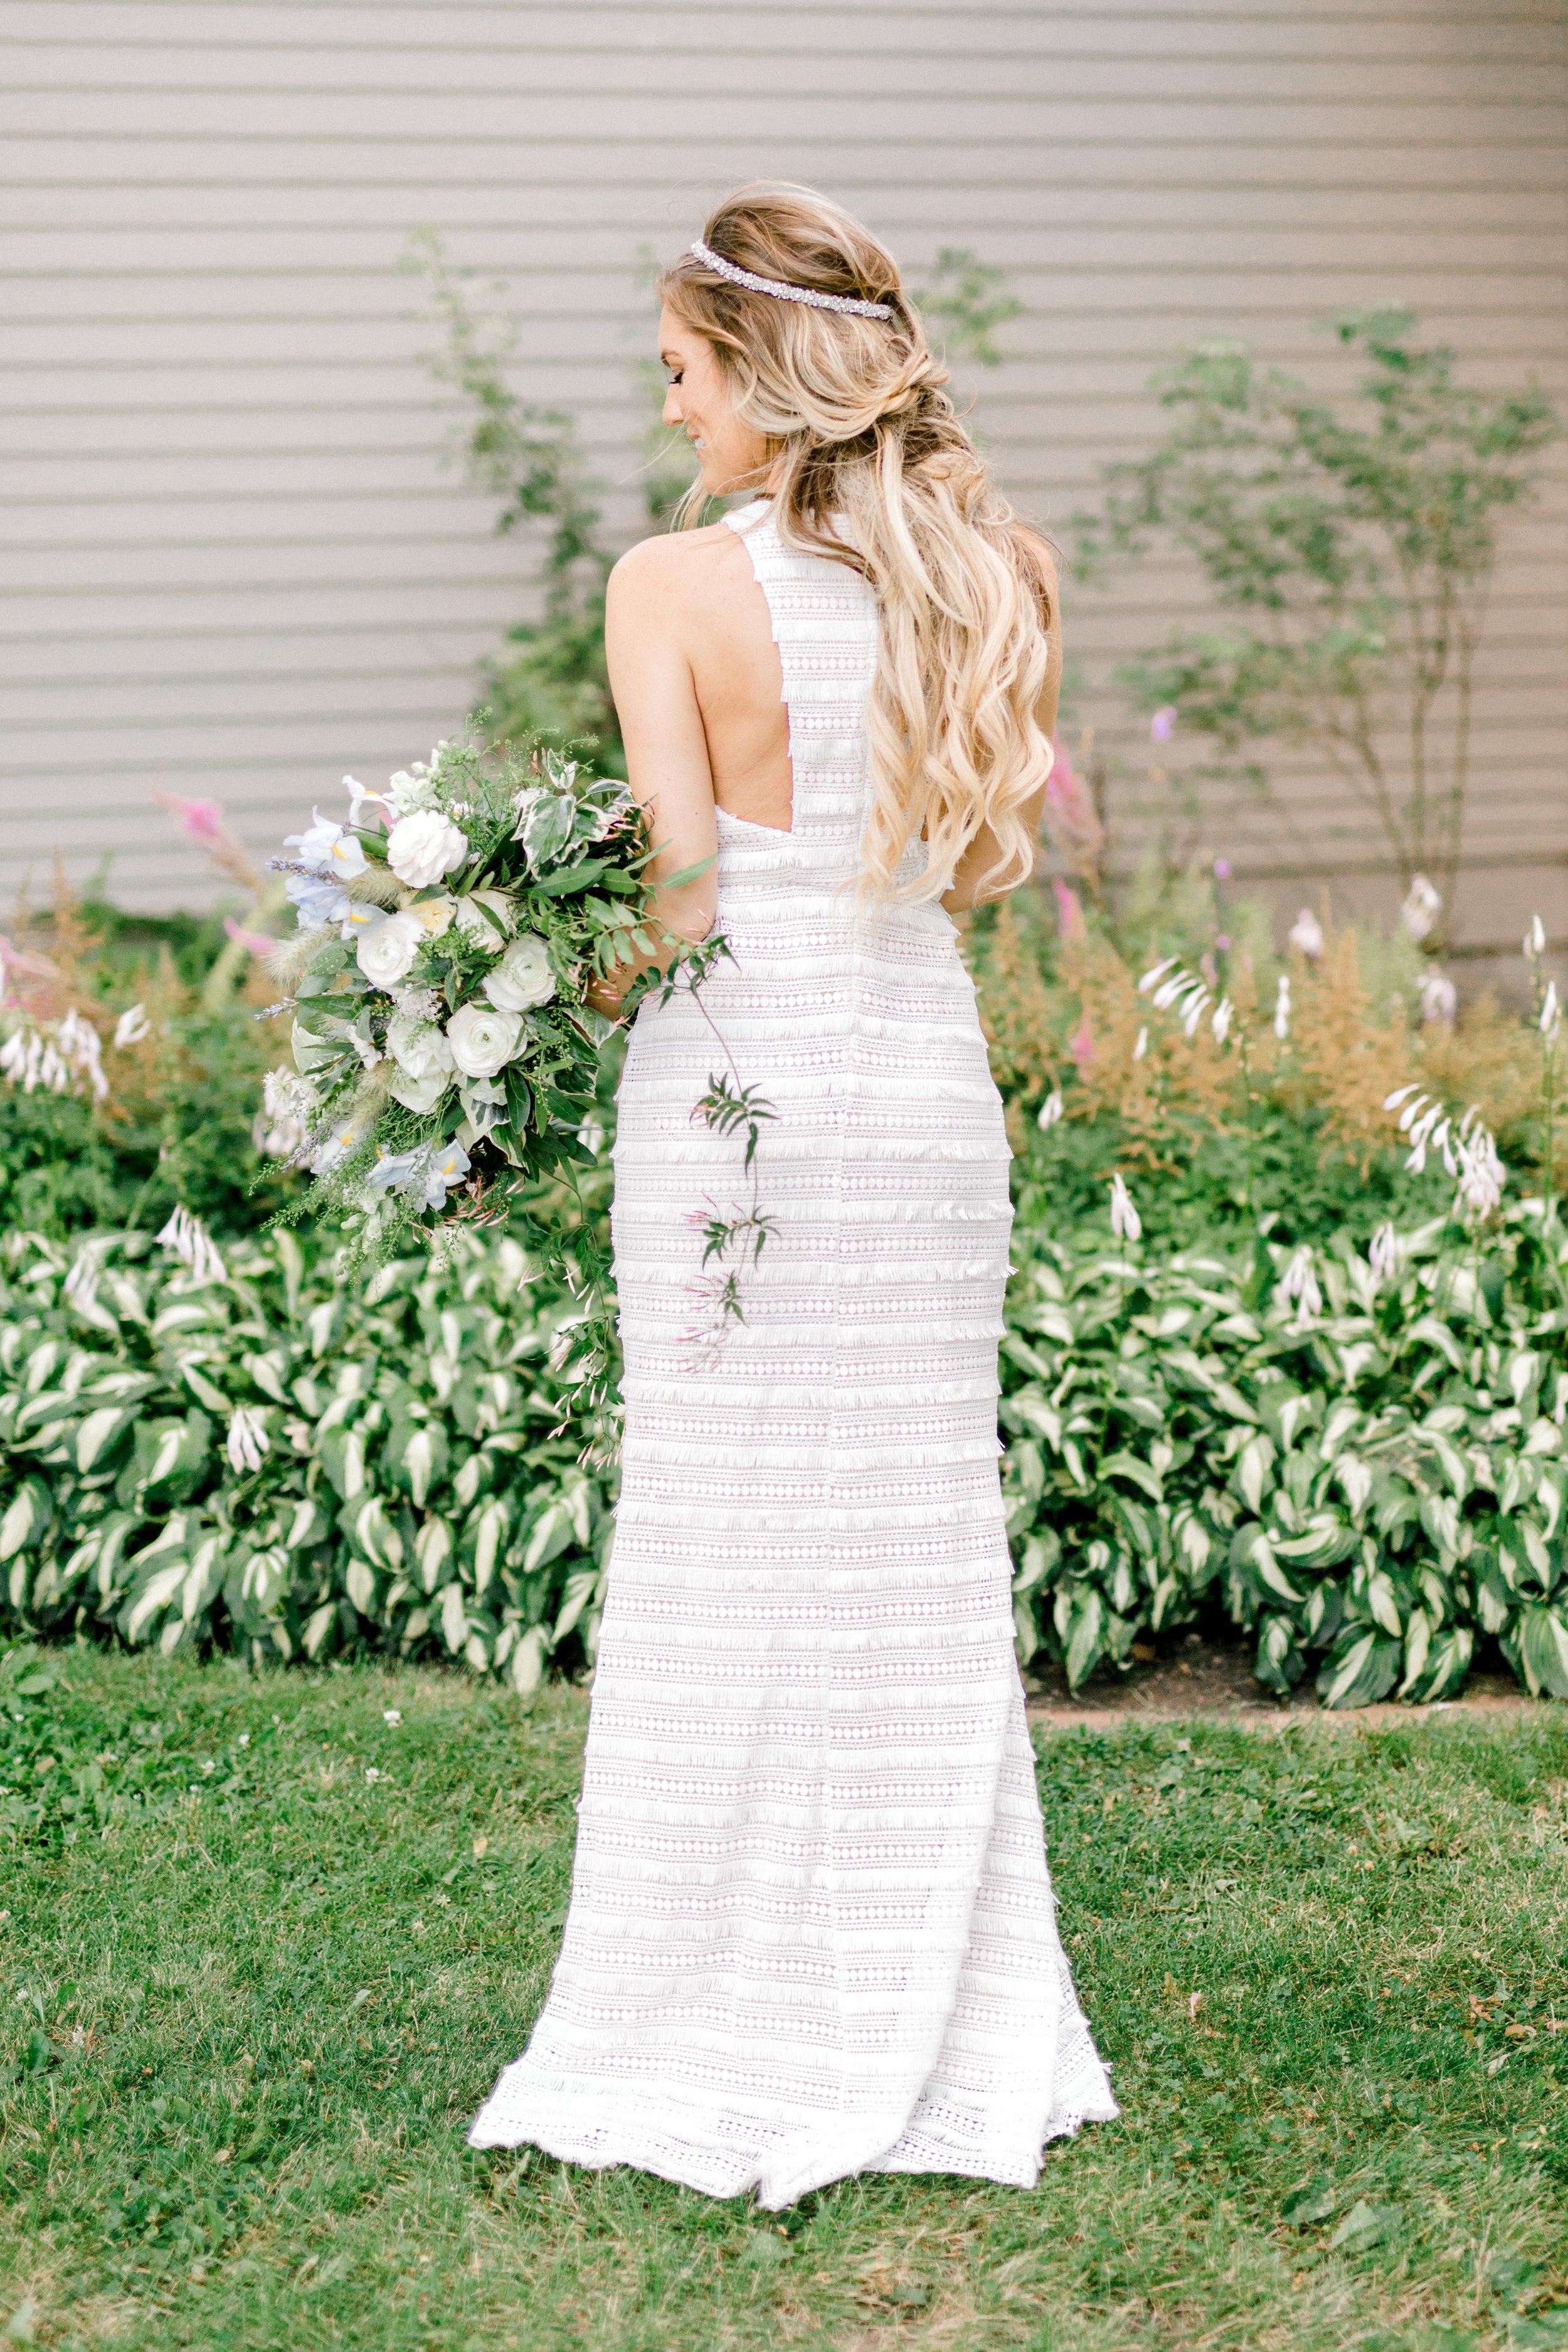 Rochester-MN-Wedding-Photographer-Finery-Boutique-89.jpg